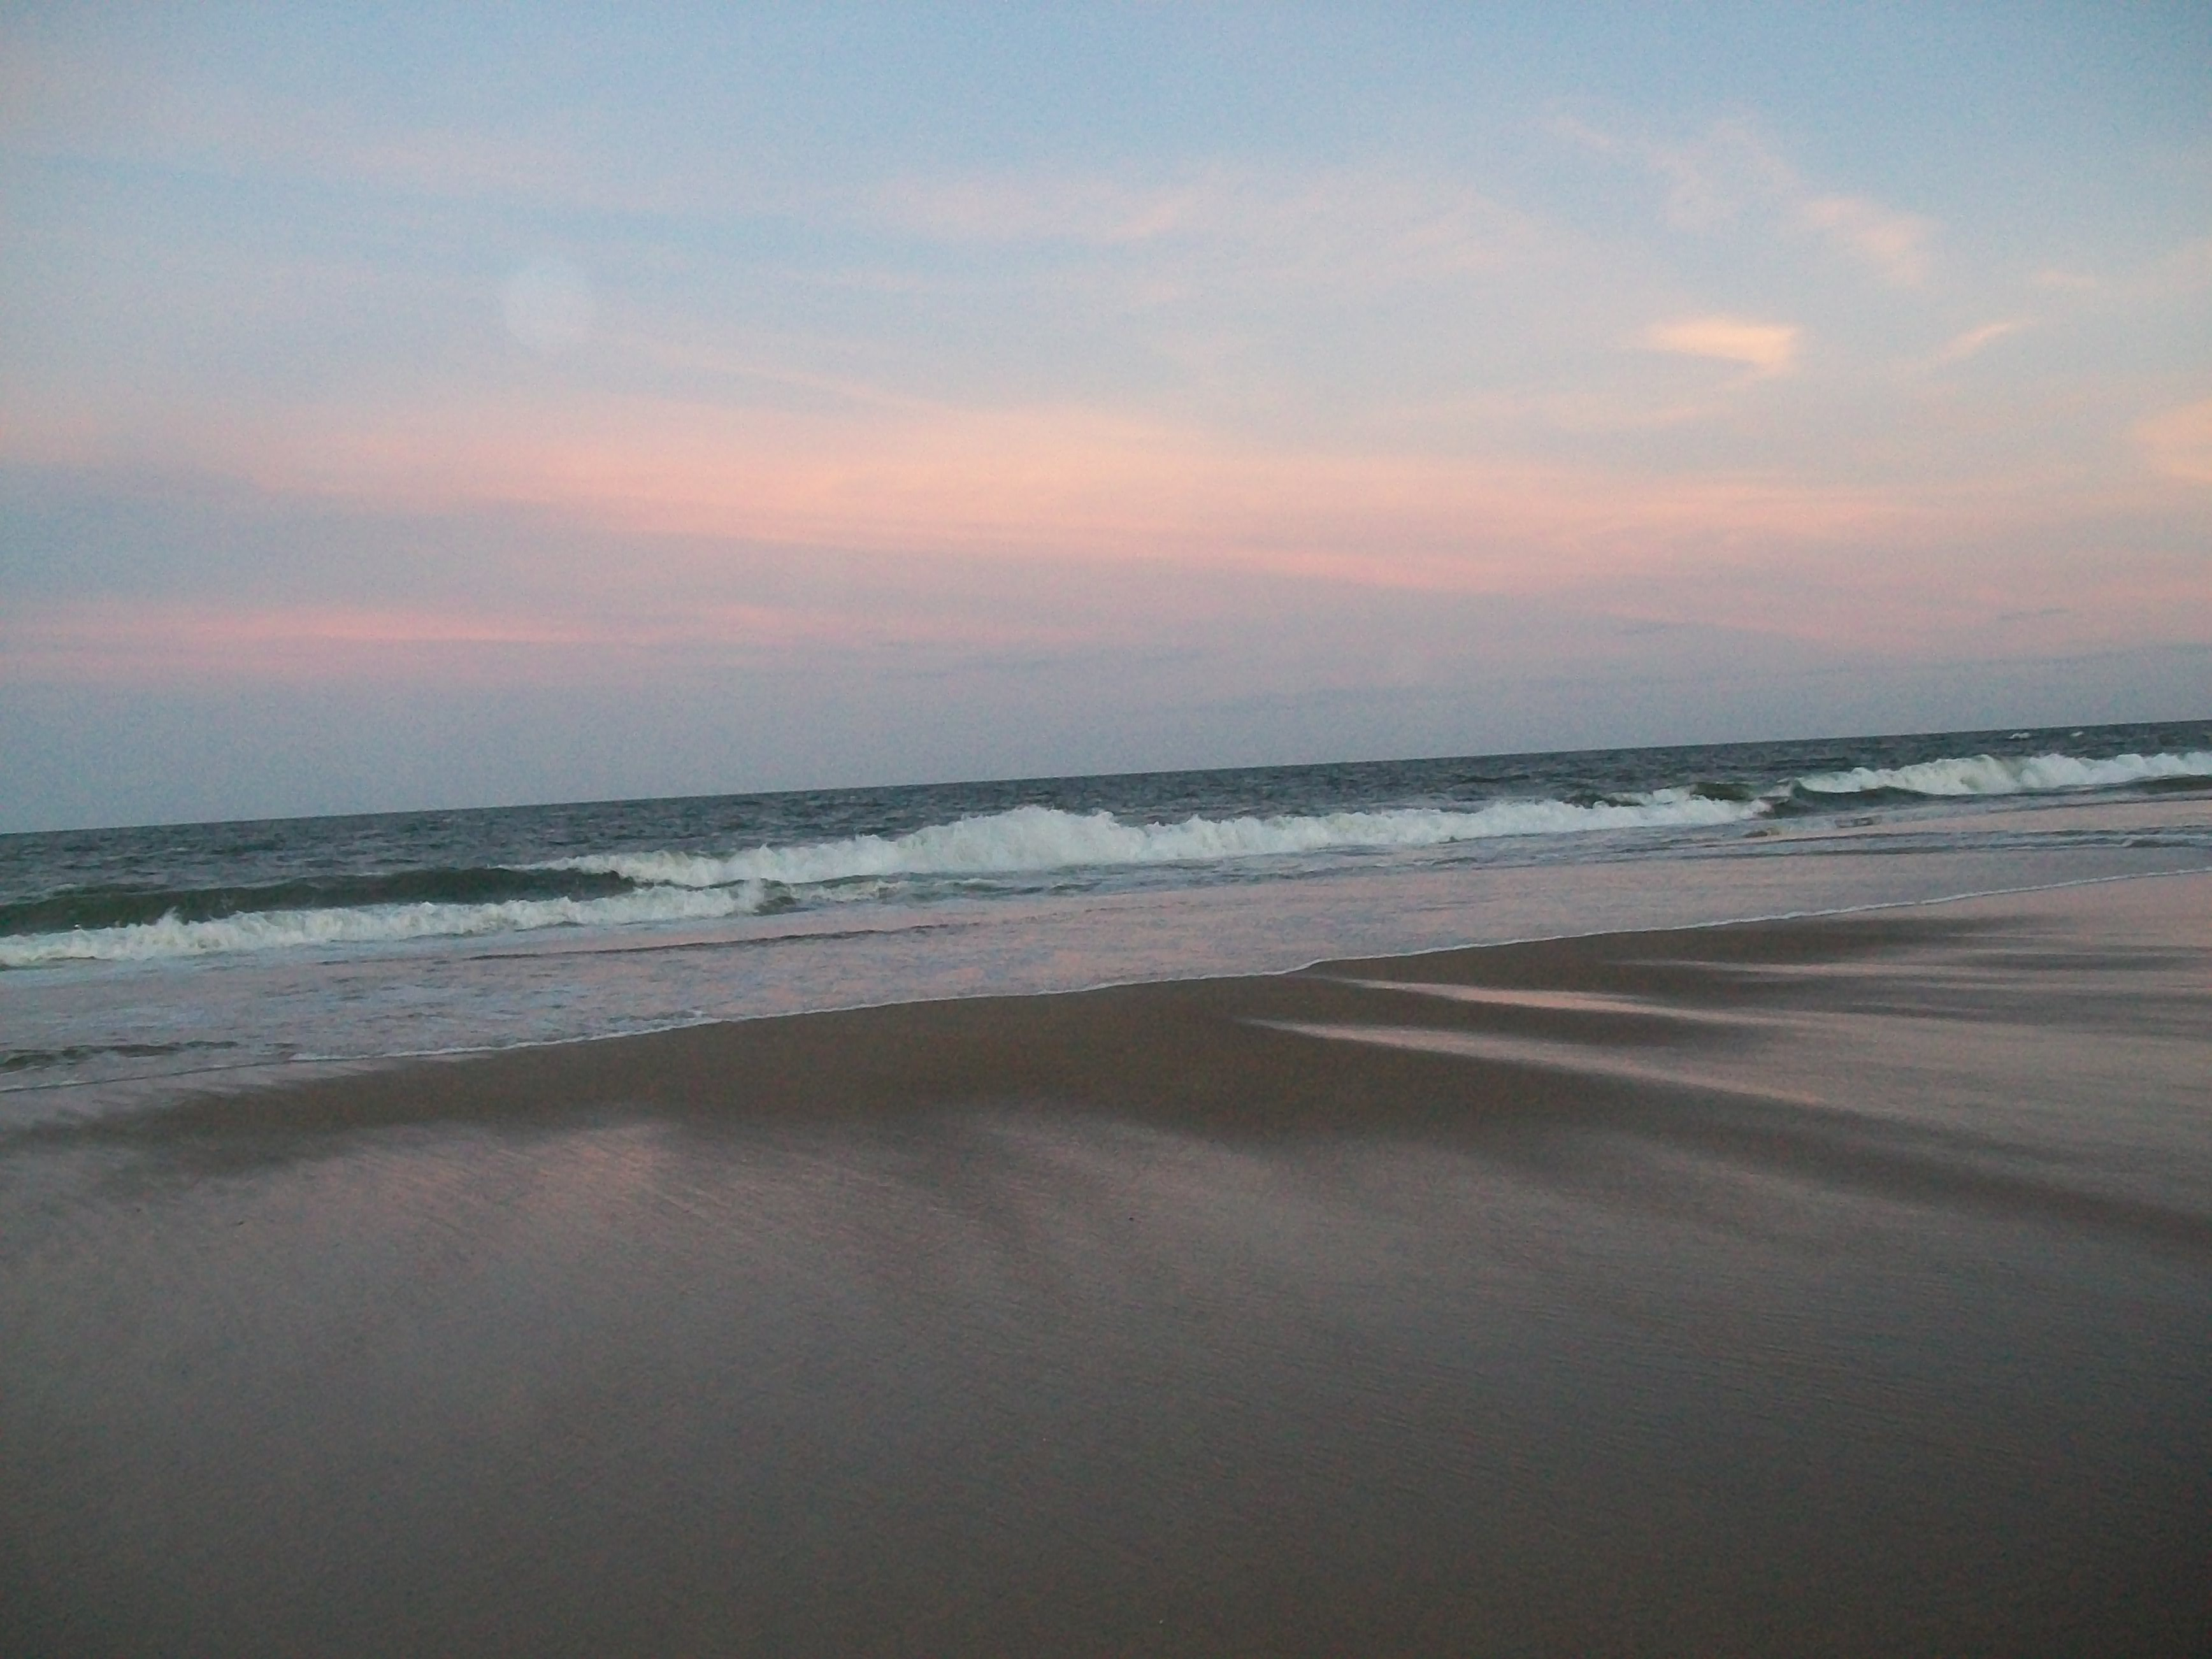 The sunset glow on Fenwick Island's shore